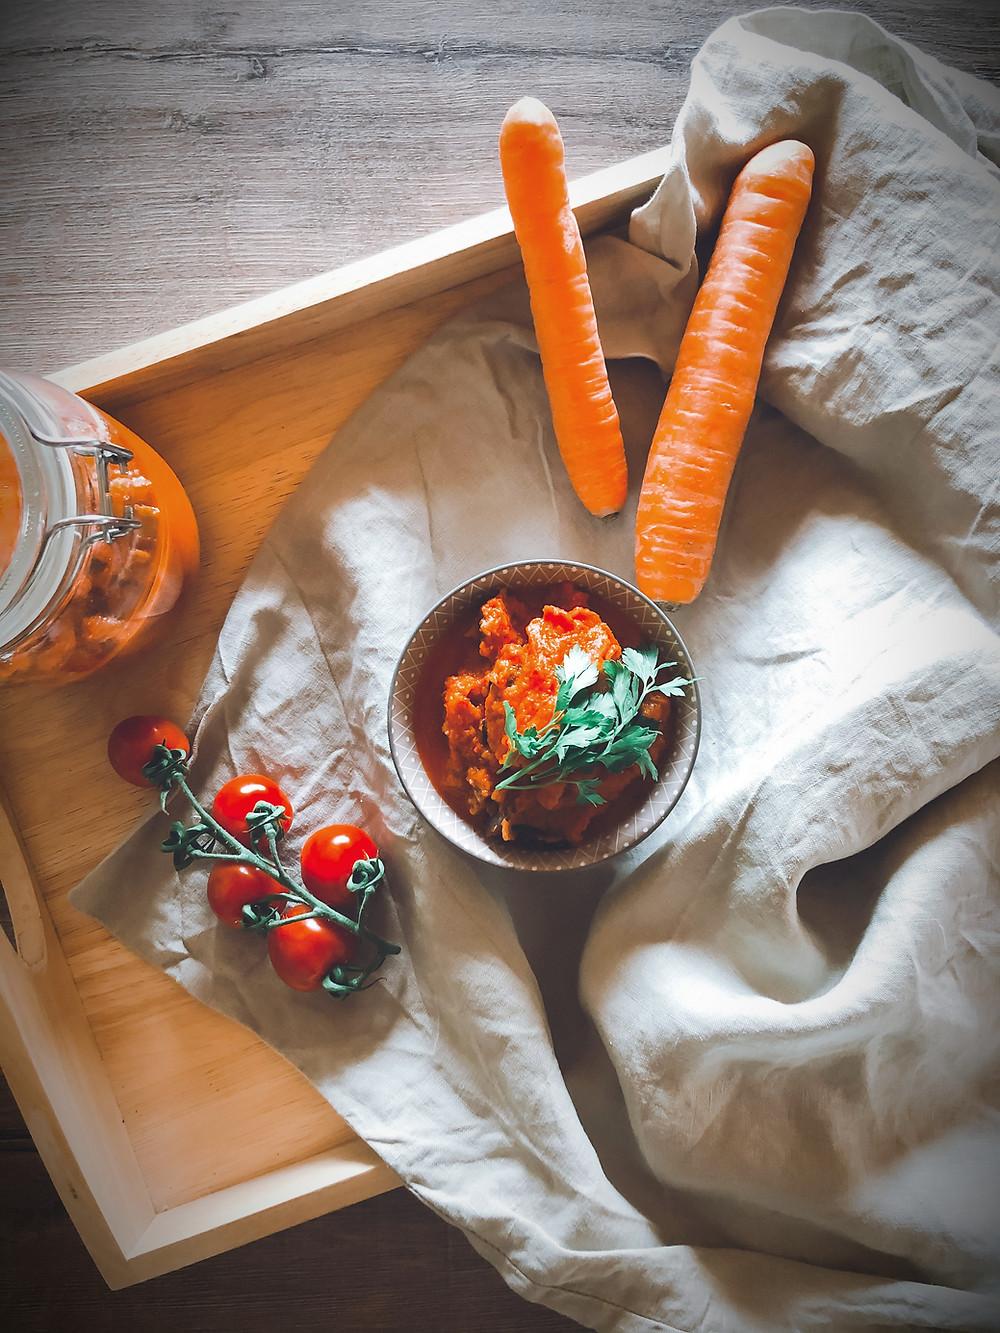 focusflowfood focus flow food gesundes rezept ajvar vegan zum selber machen fitnessfood mealprep